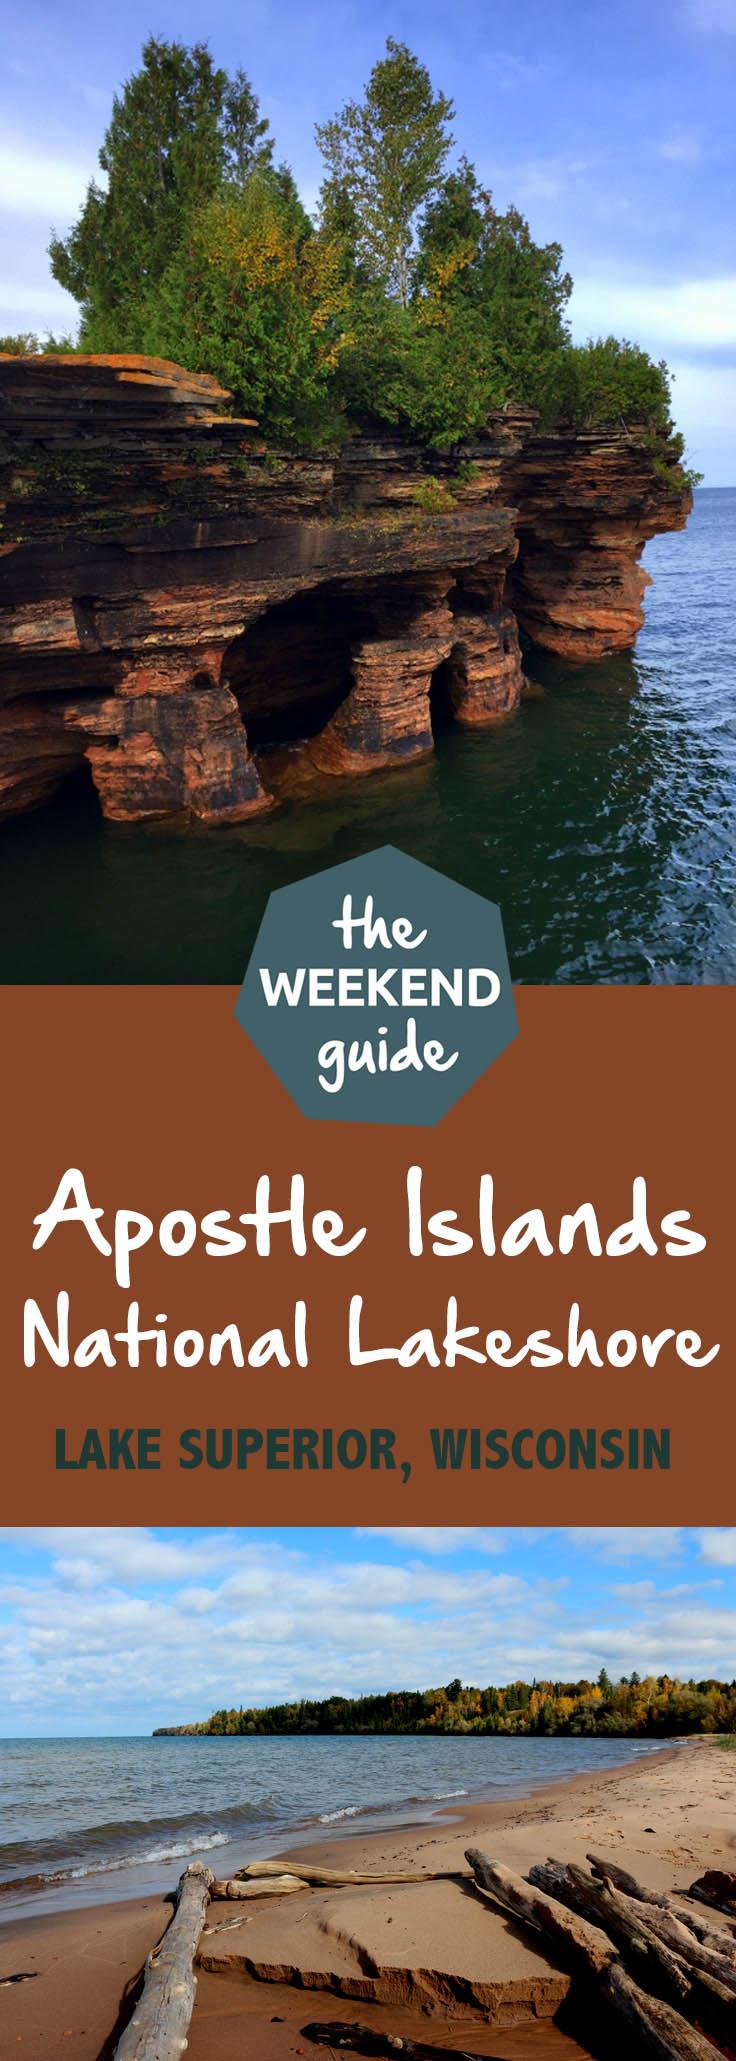 Apostle Islands National Lakeshore :: Apostle Islands Things To Do :: Lodging Near Apostle Islands National Lakeshore :: What to do Apostle Islands :: Wisconsin #apostleislands #wisconsin